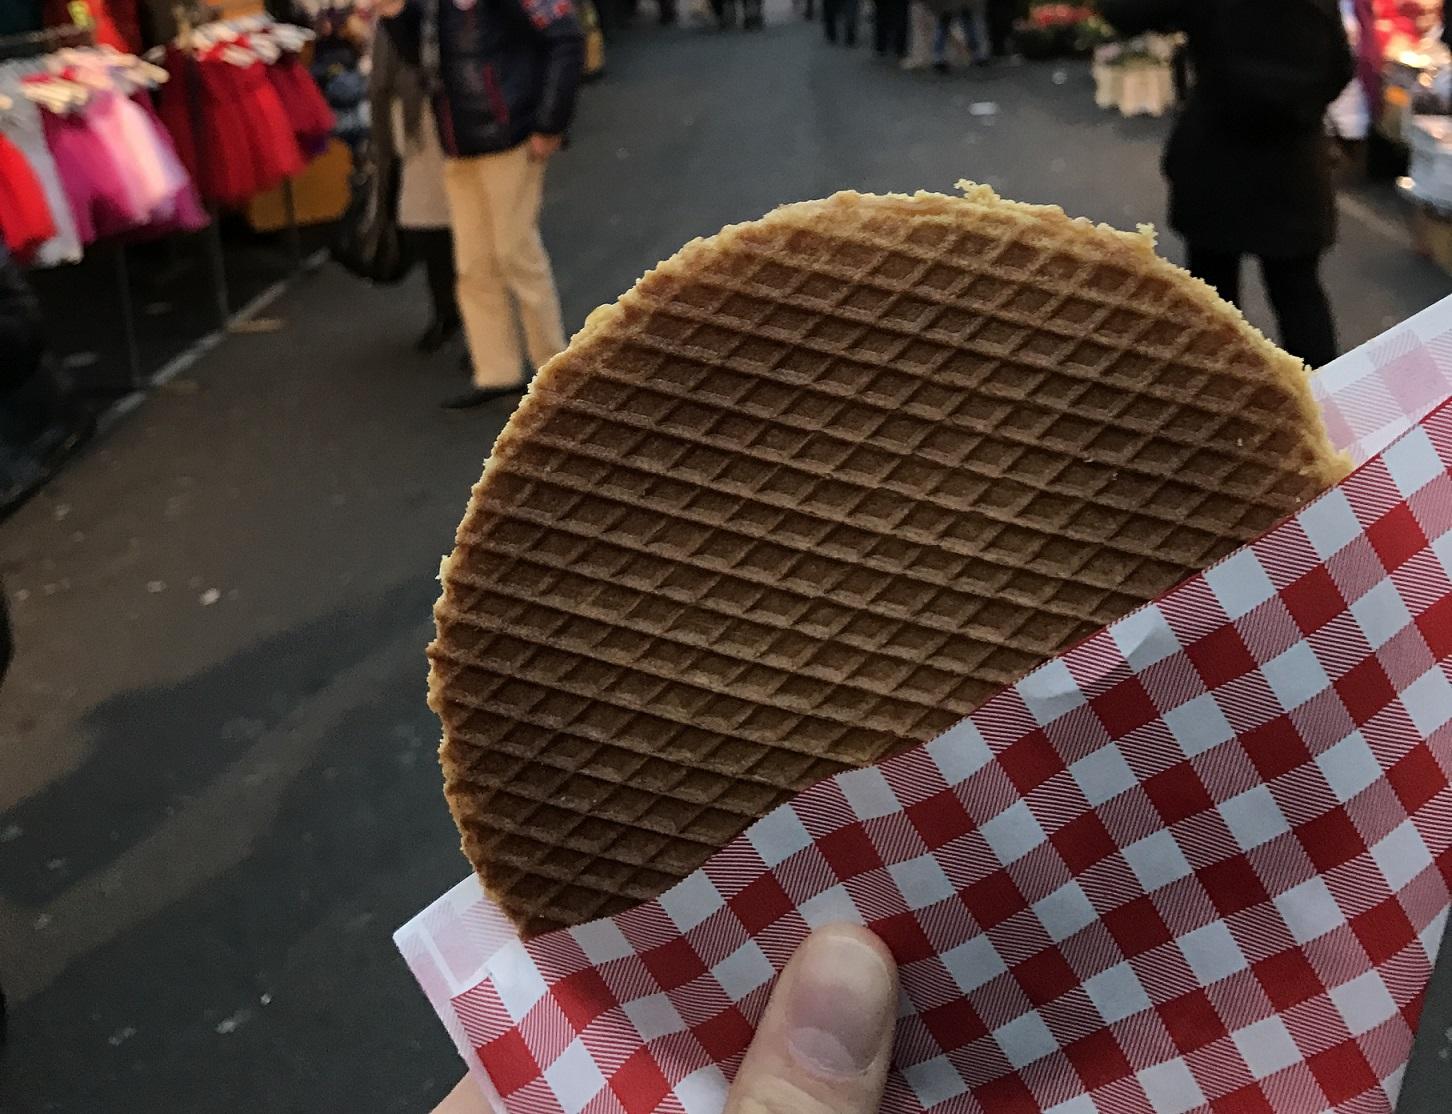 Local food in Amsterdam: Stroopwafel